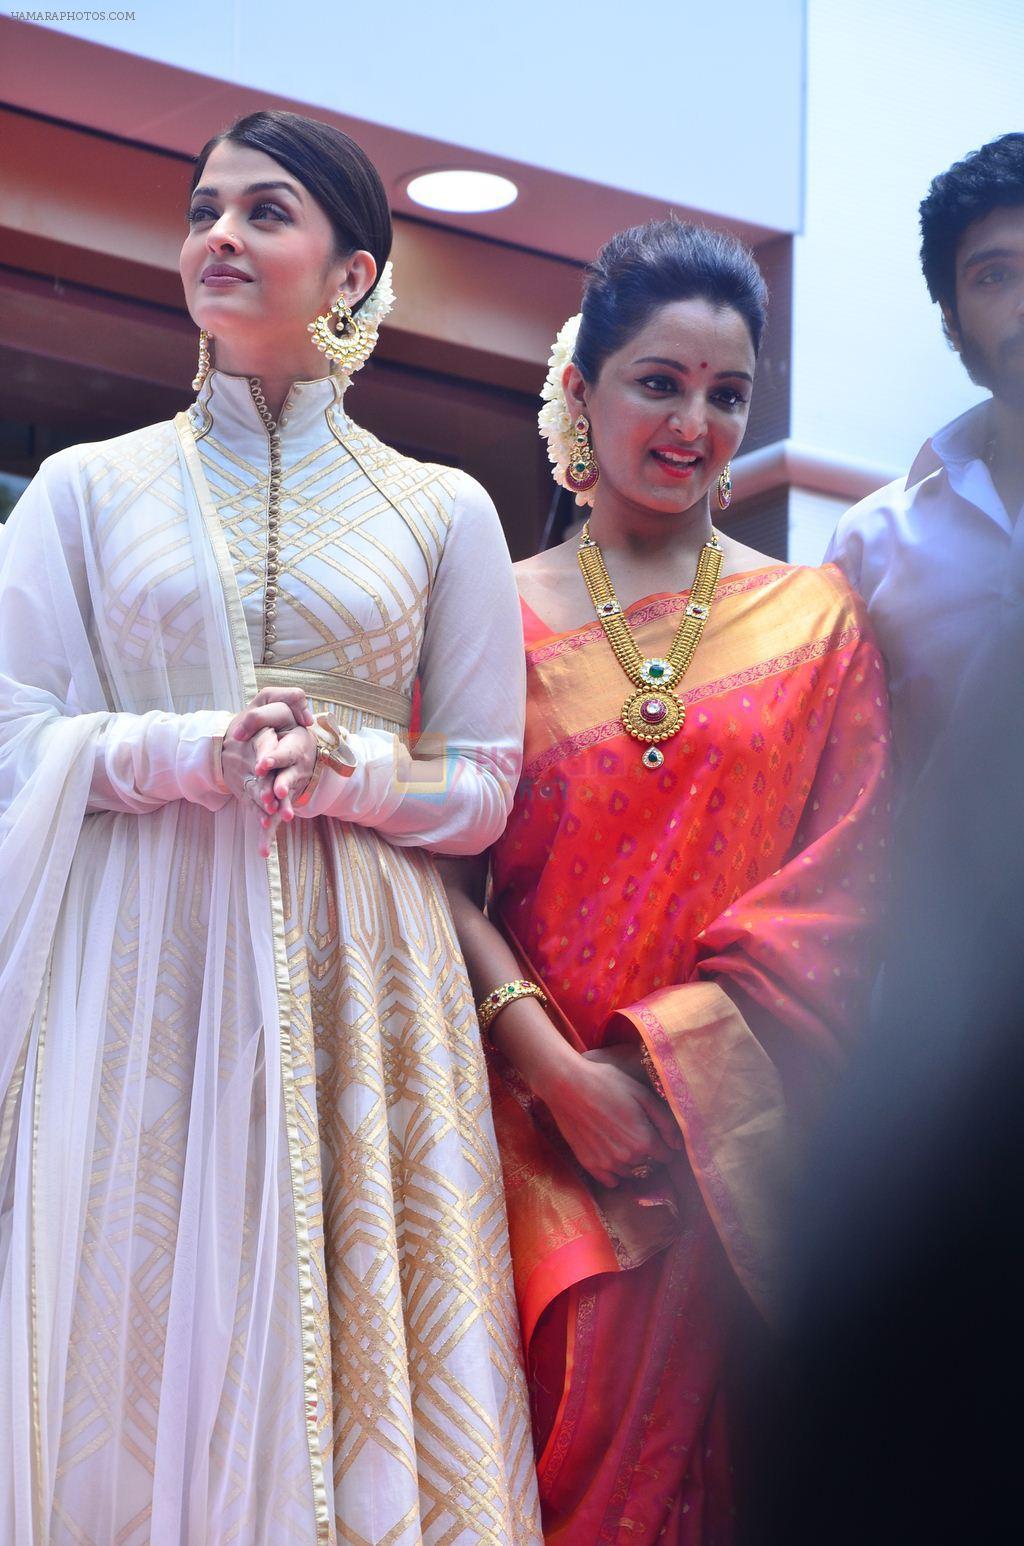 aishwarya rai bachchan at kalyan jewellers showroom in chennai on